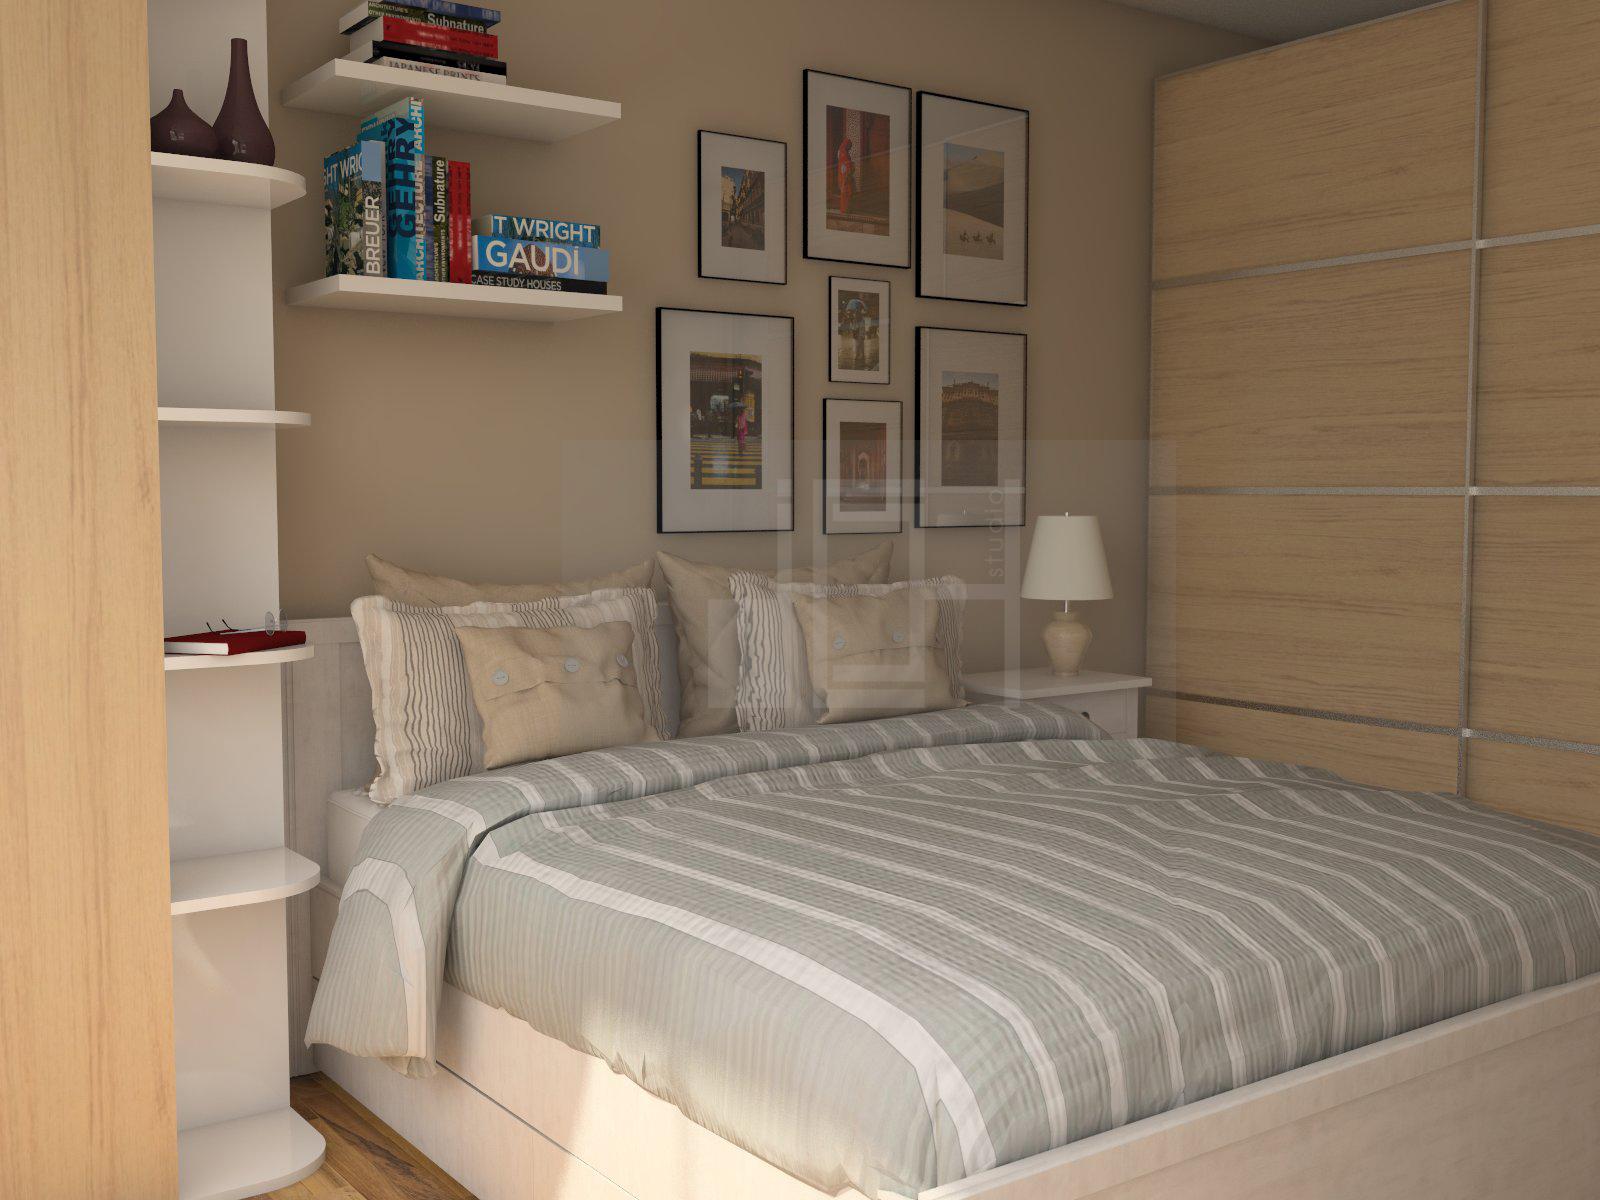 Design bedroom wood wardrobe frame wall Vratsa